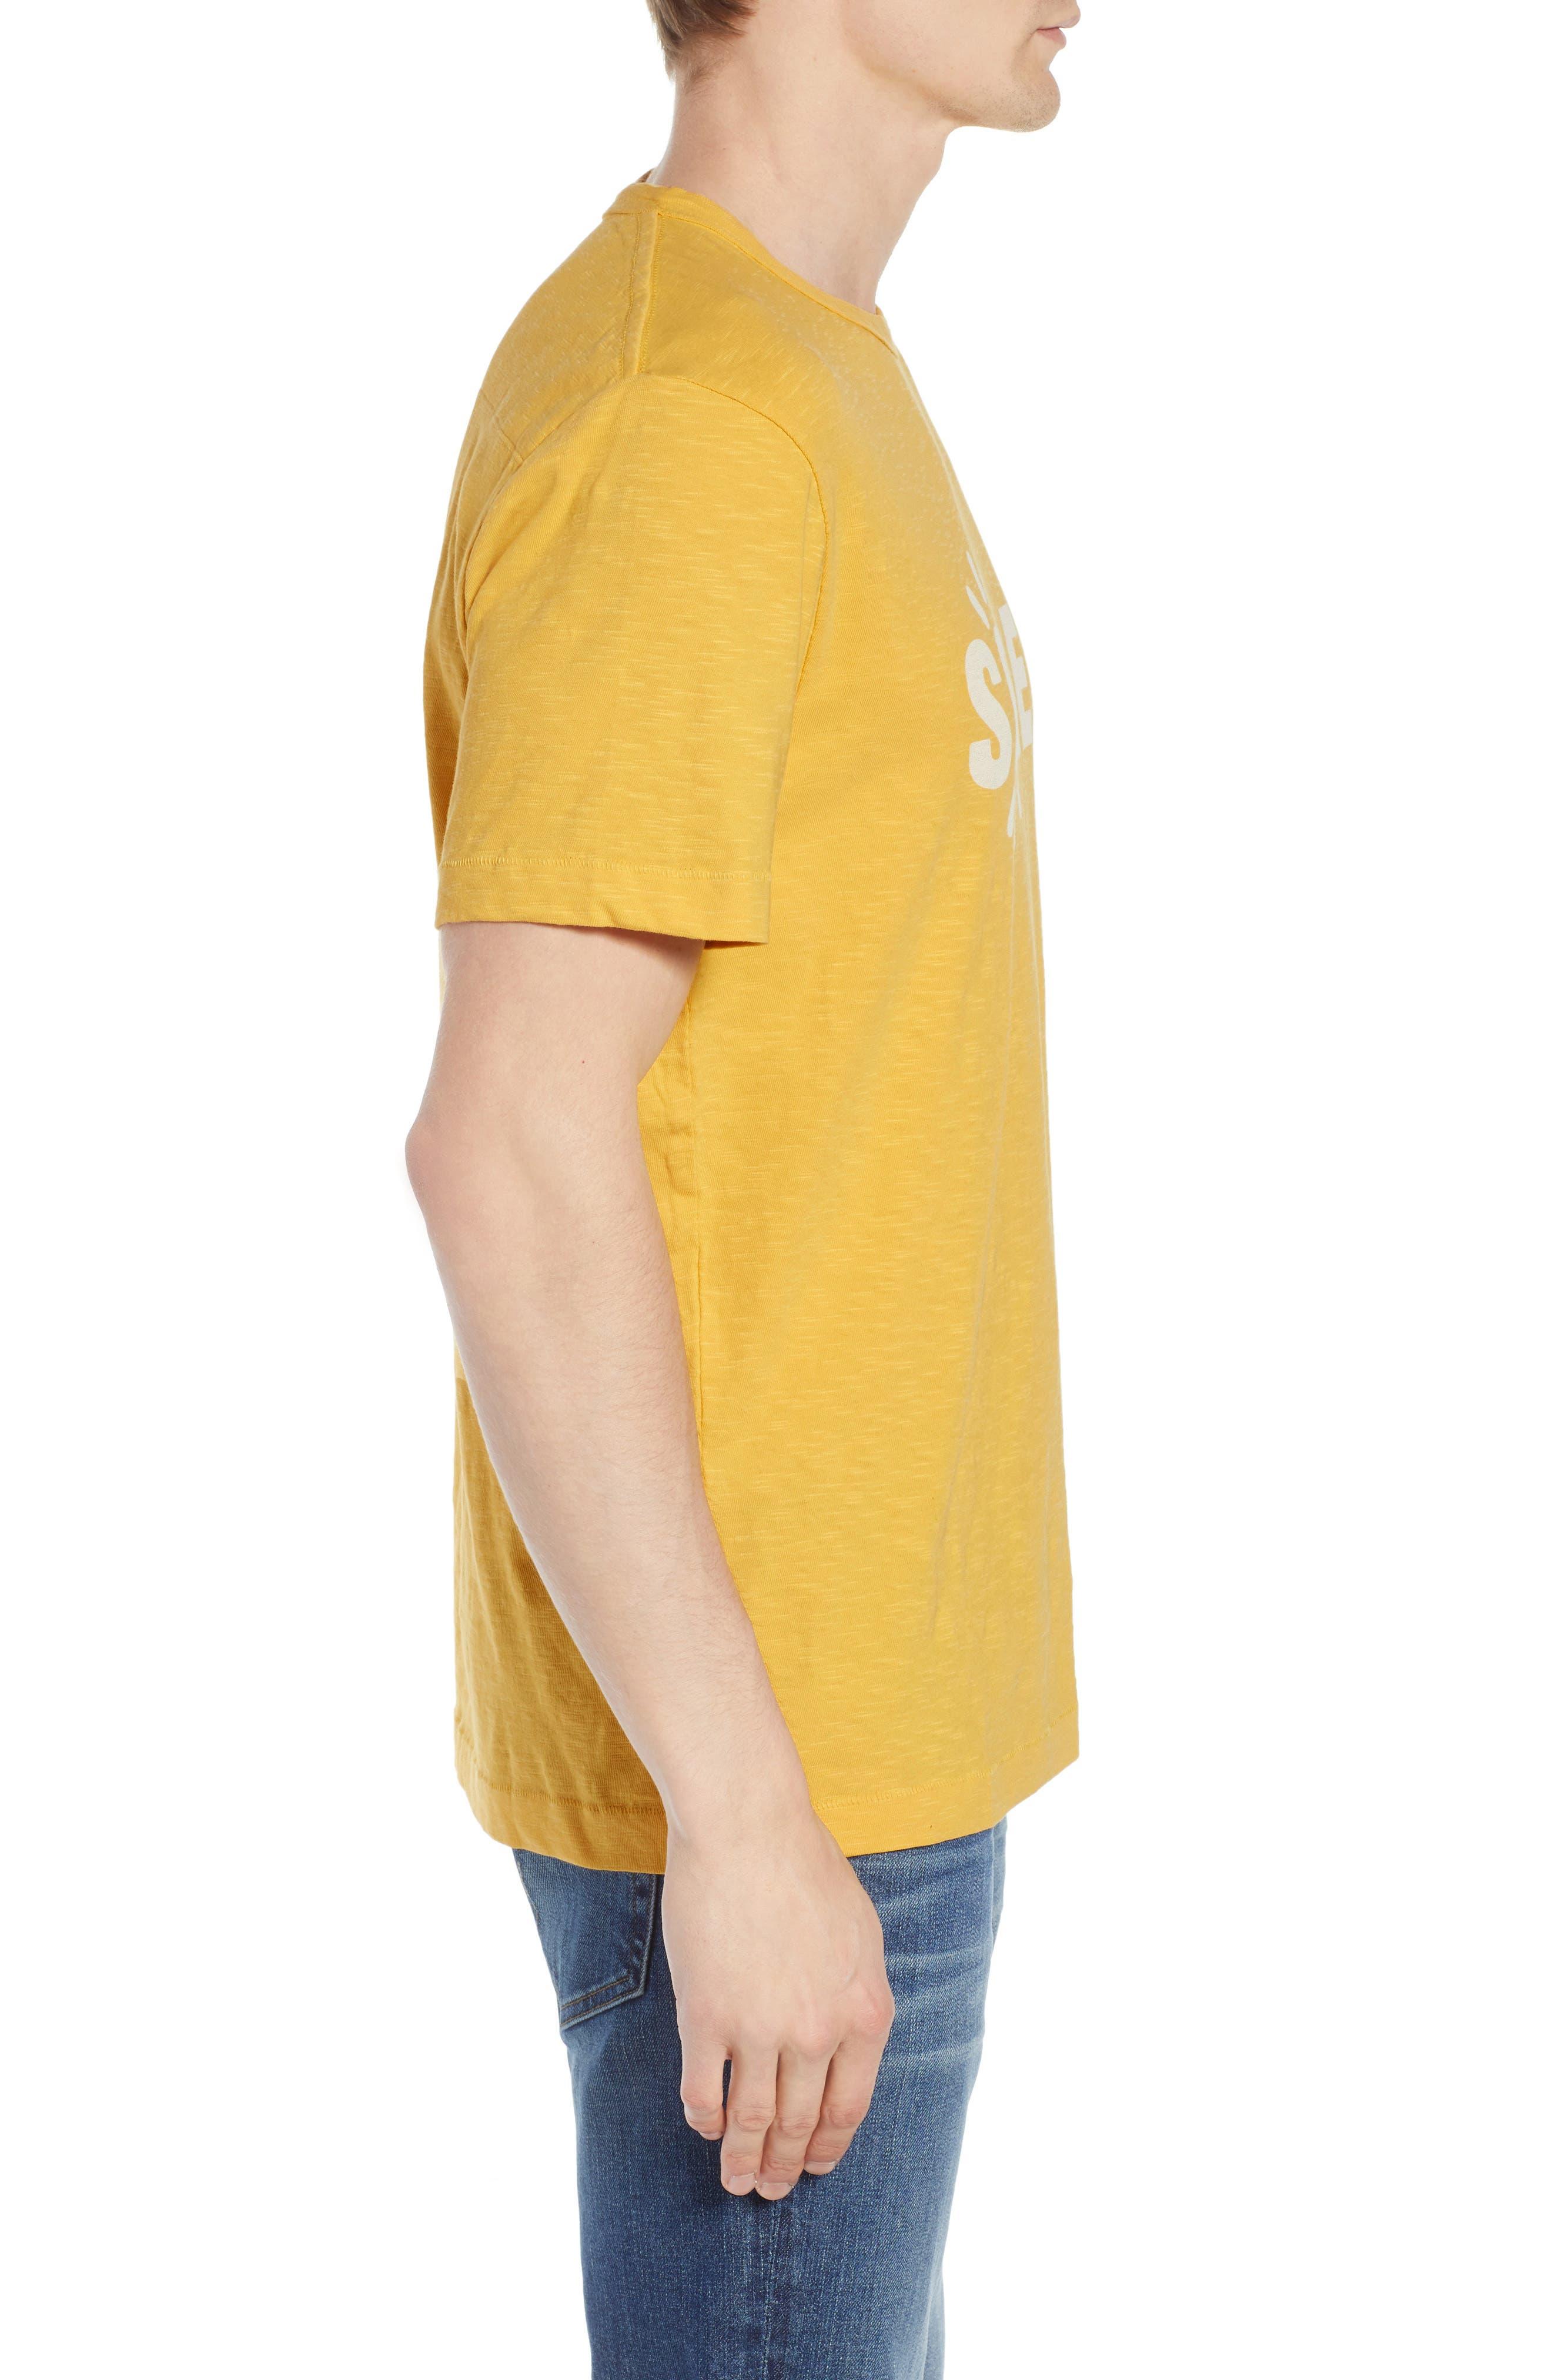 Soleil T-Shirt,                             Alternate thumbnail 4, color,                             Banana